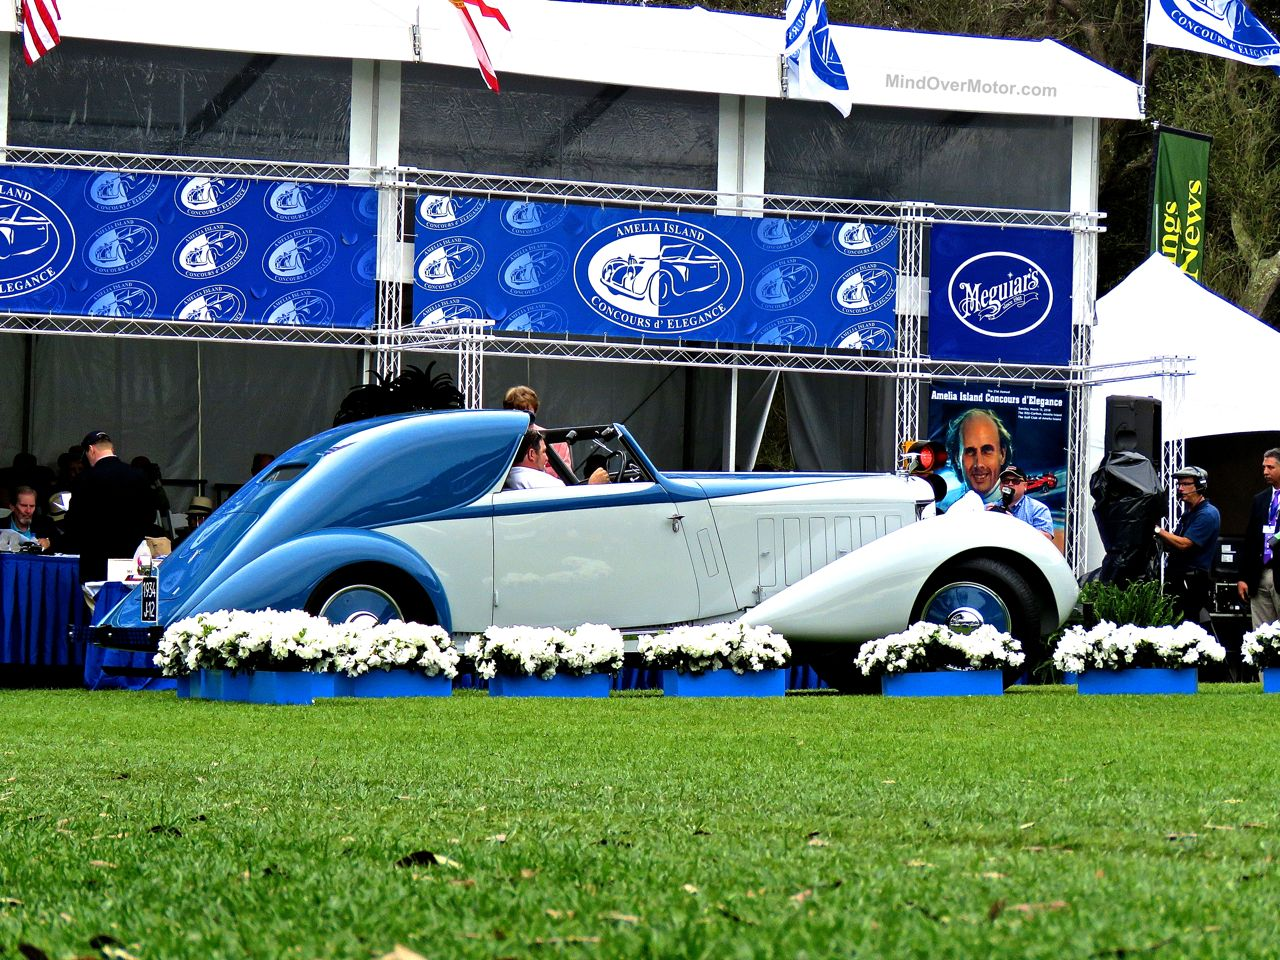 Amelia Island Concours Hispano-Suiza J12 Sedanca Coupe